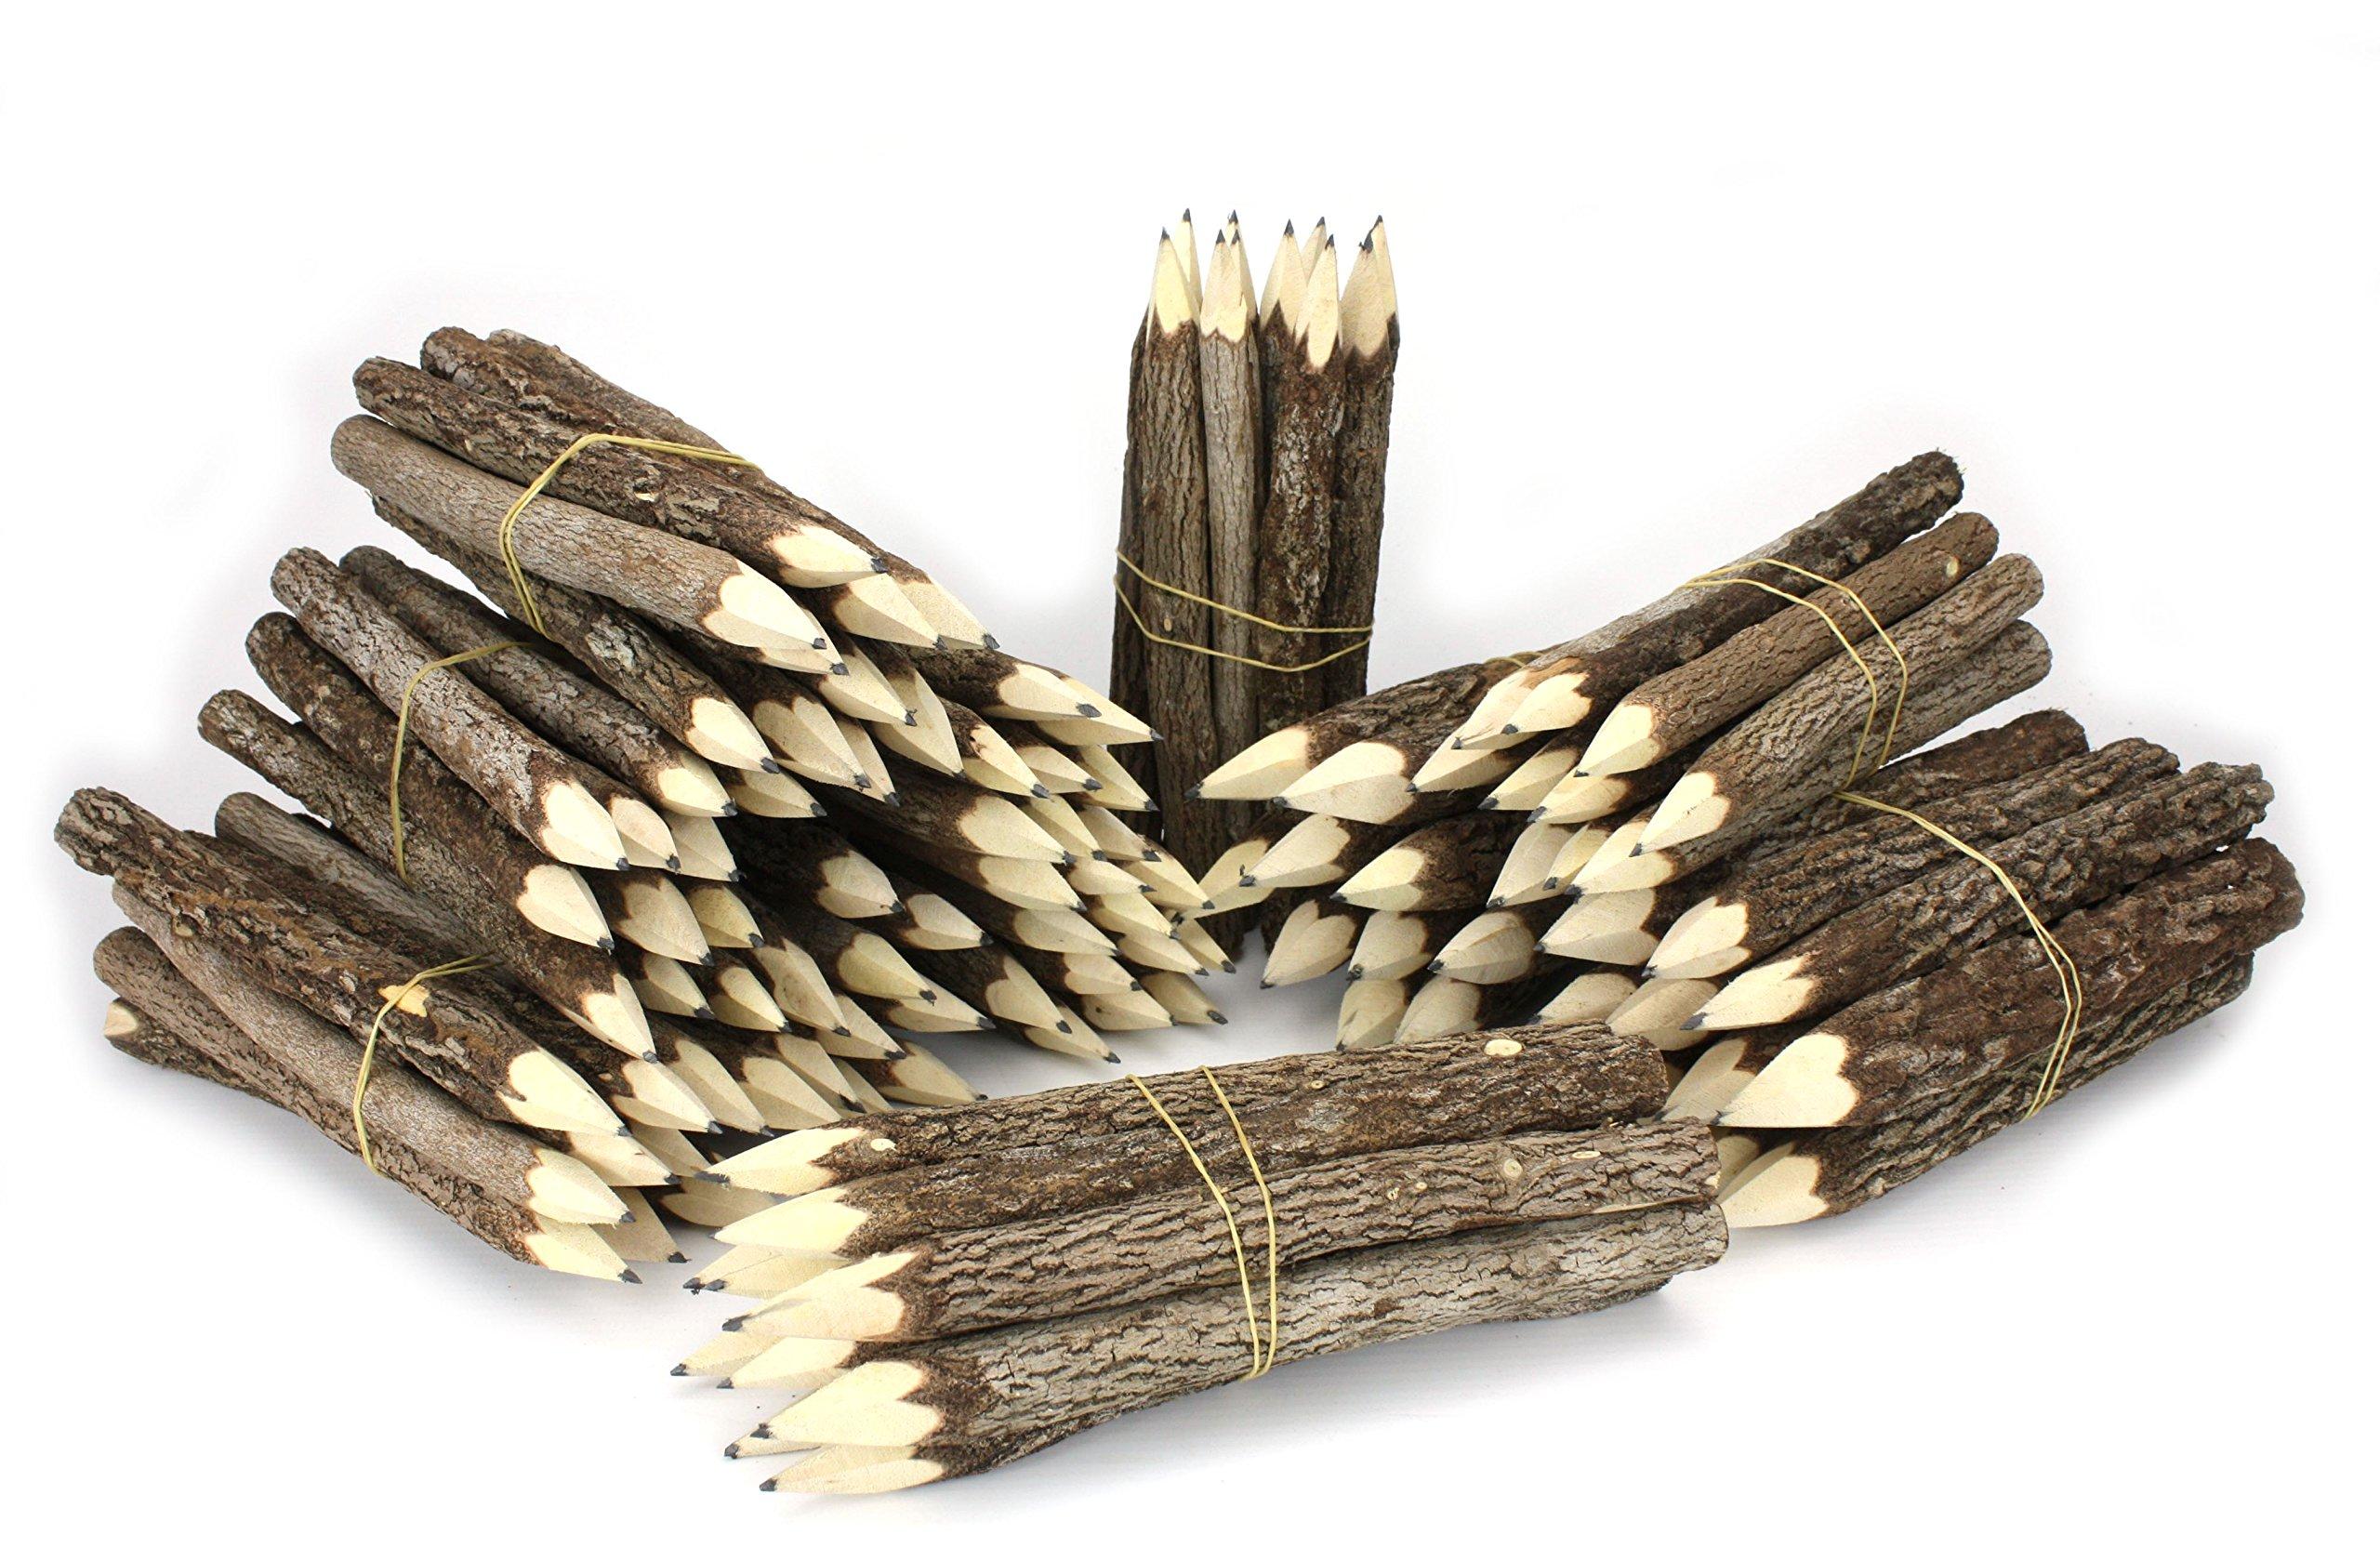 Farang Thai Tree Branch Twig Pencil Bundle 10 Bundles Black by Farang